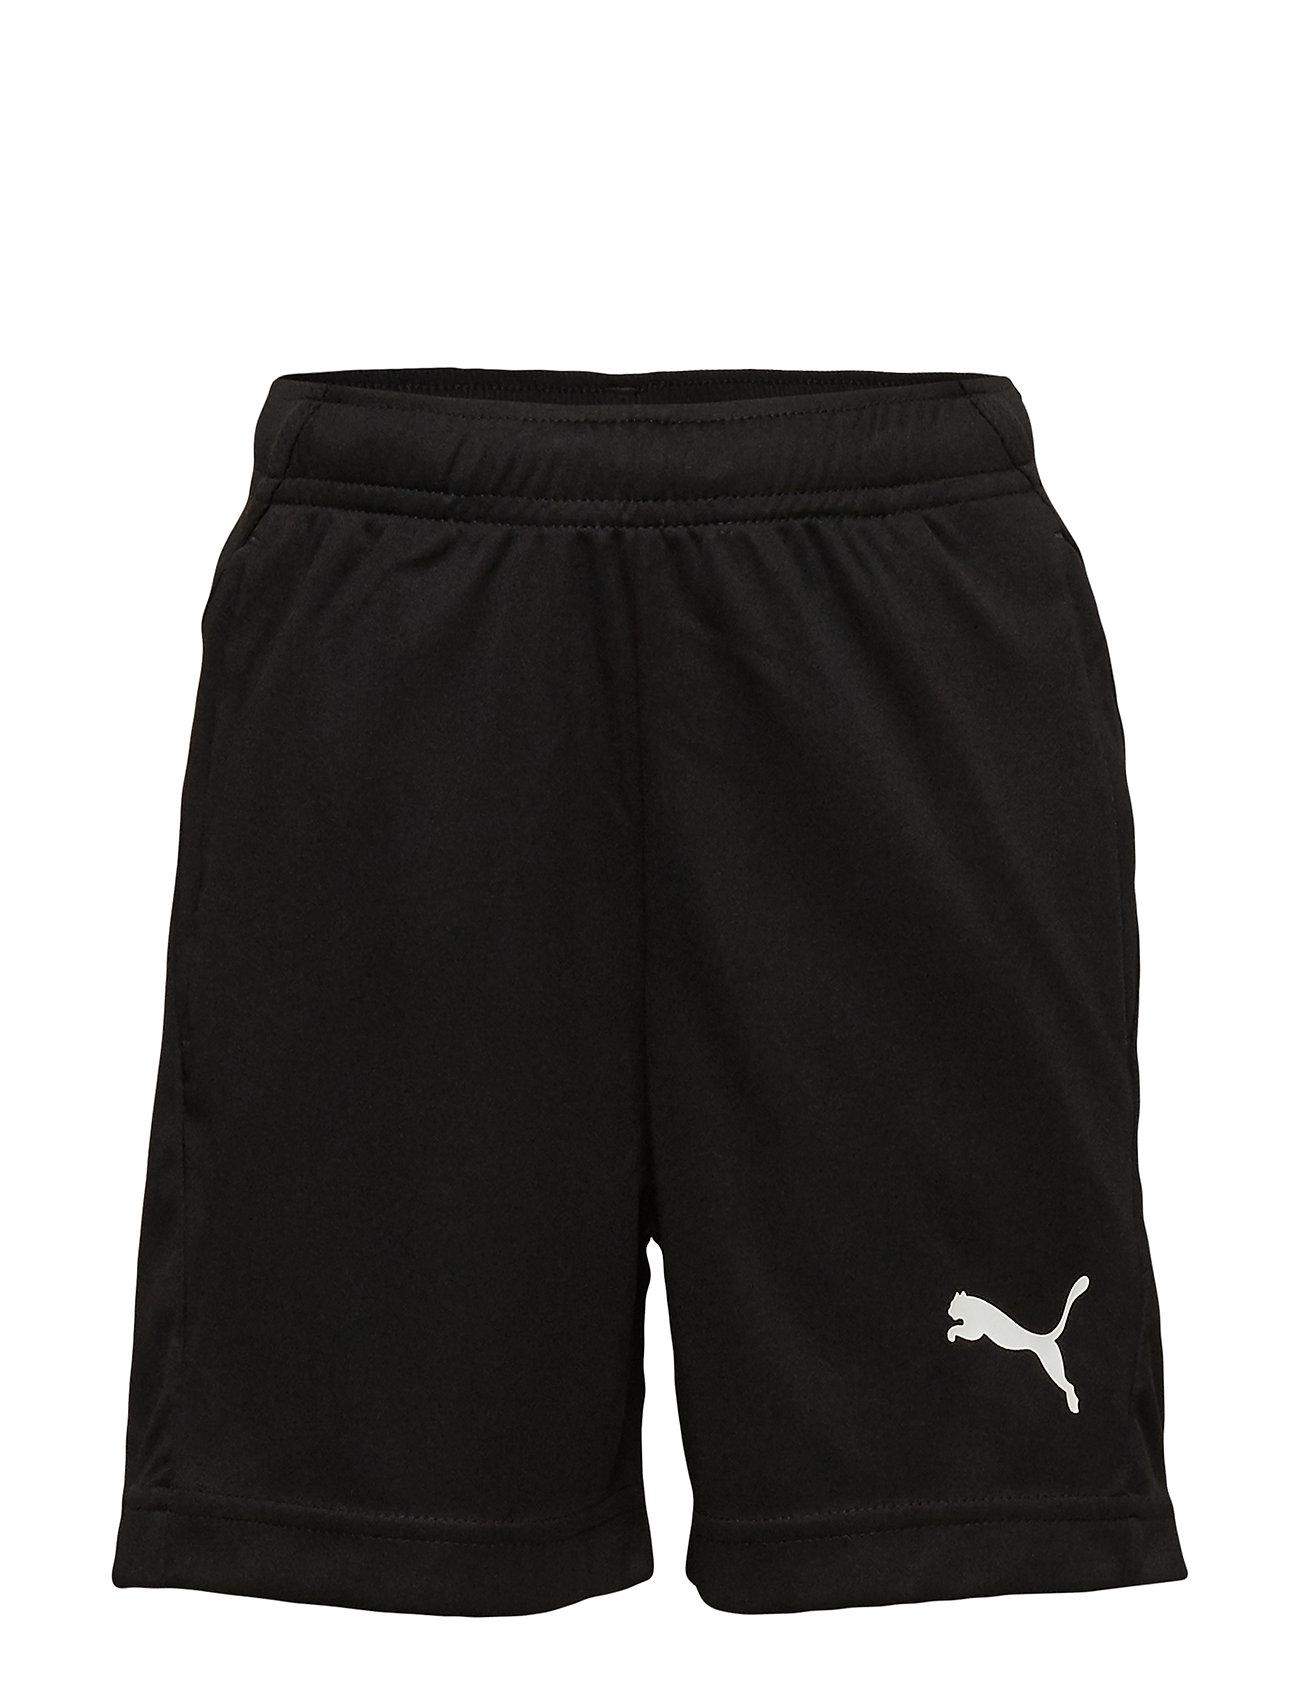 PUMA LIGA Training Shorts Jr - PUMA BLACK-PUMA WHITE